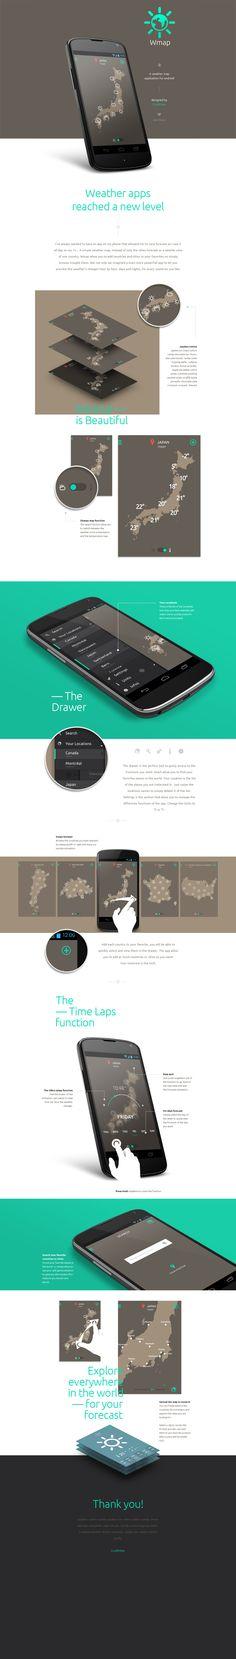 Wmap by GrafikWar | prez_900px #app #android #kitkat #ui #webdesign #weather #map